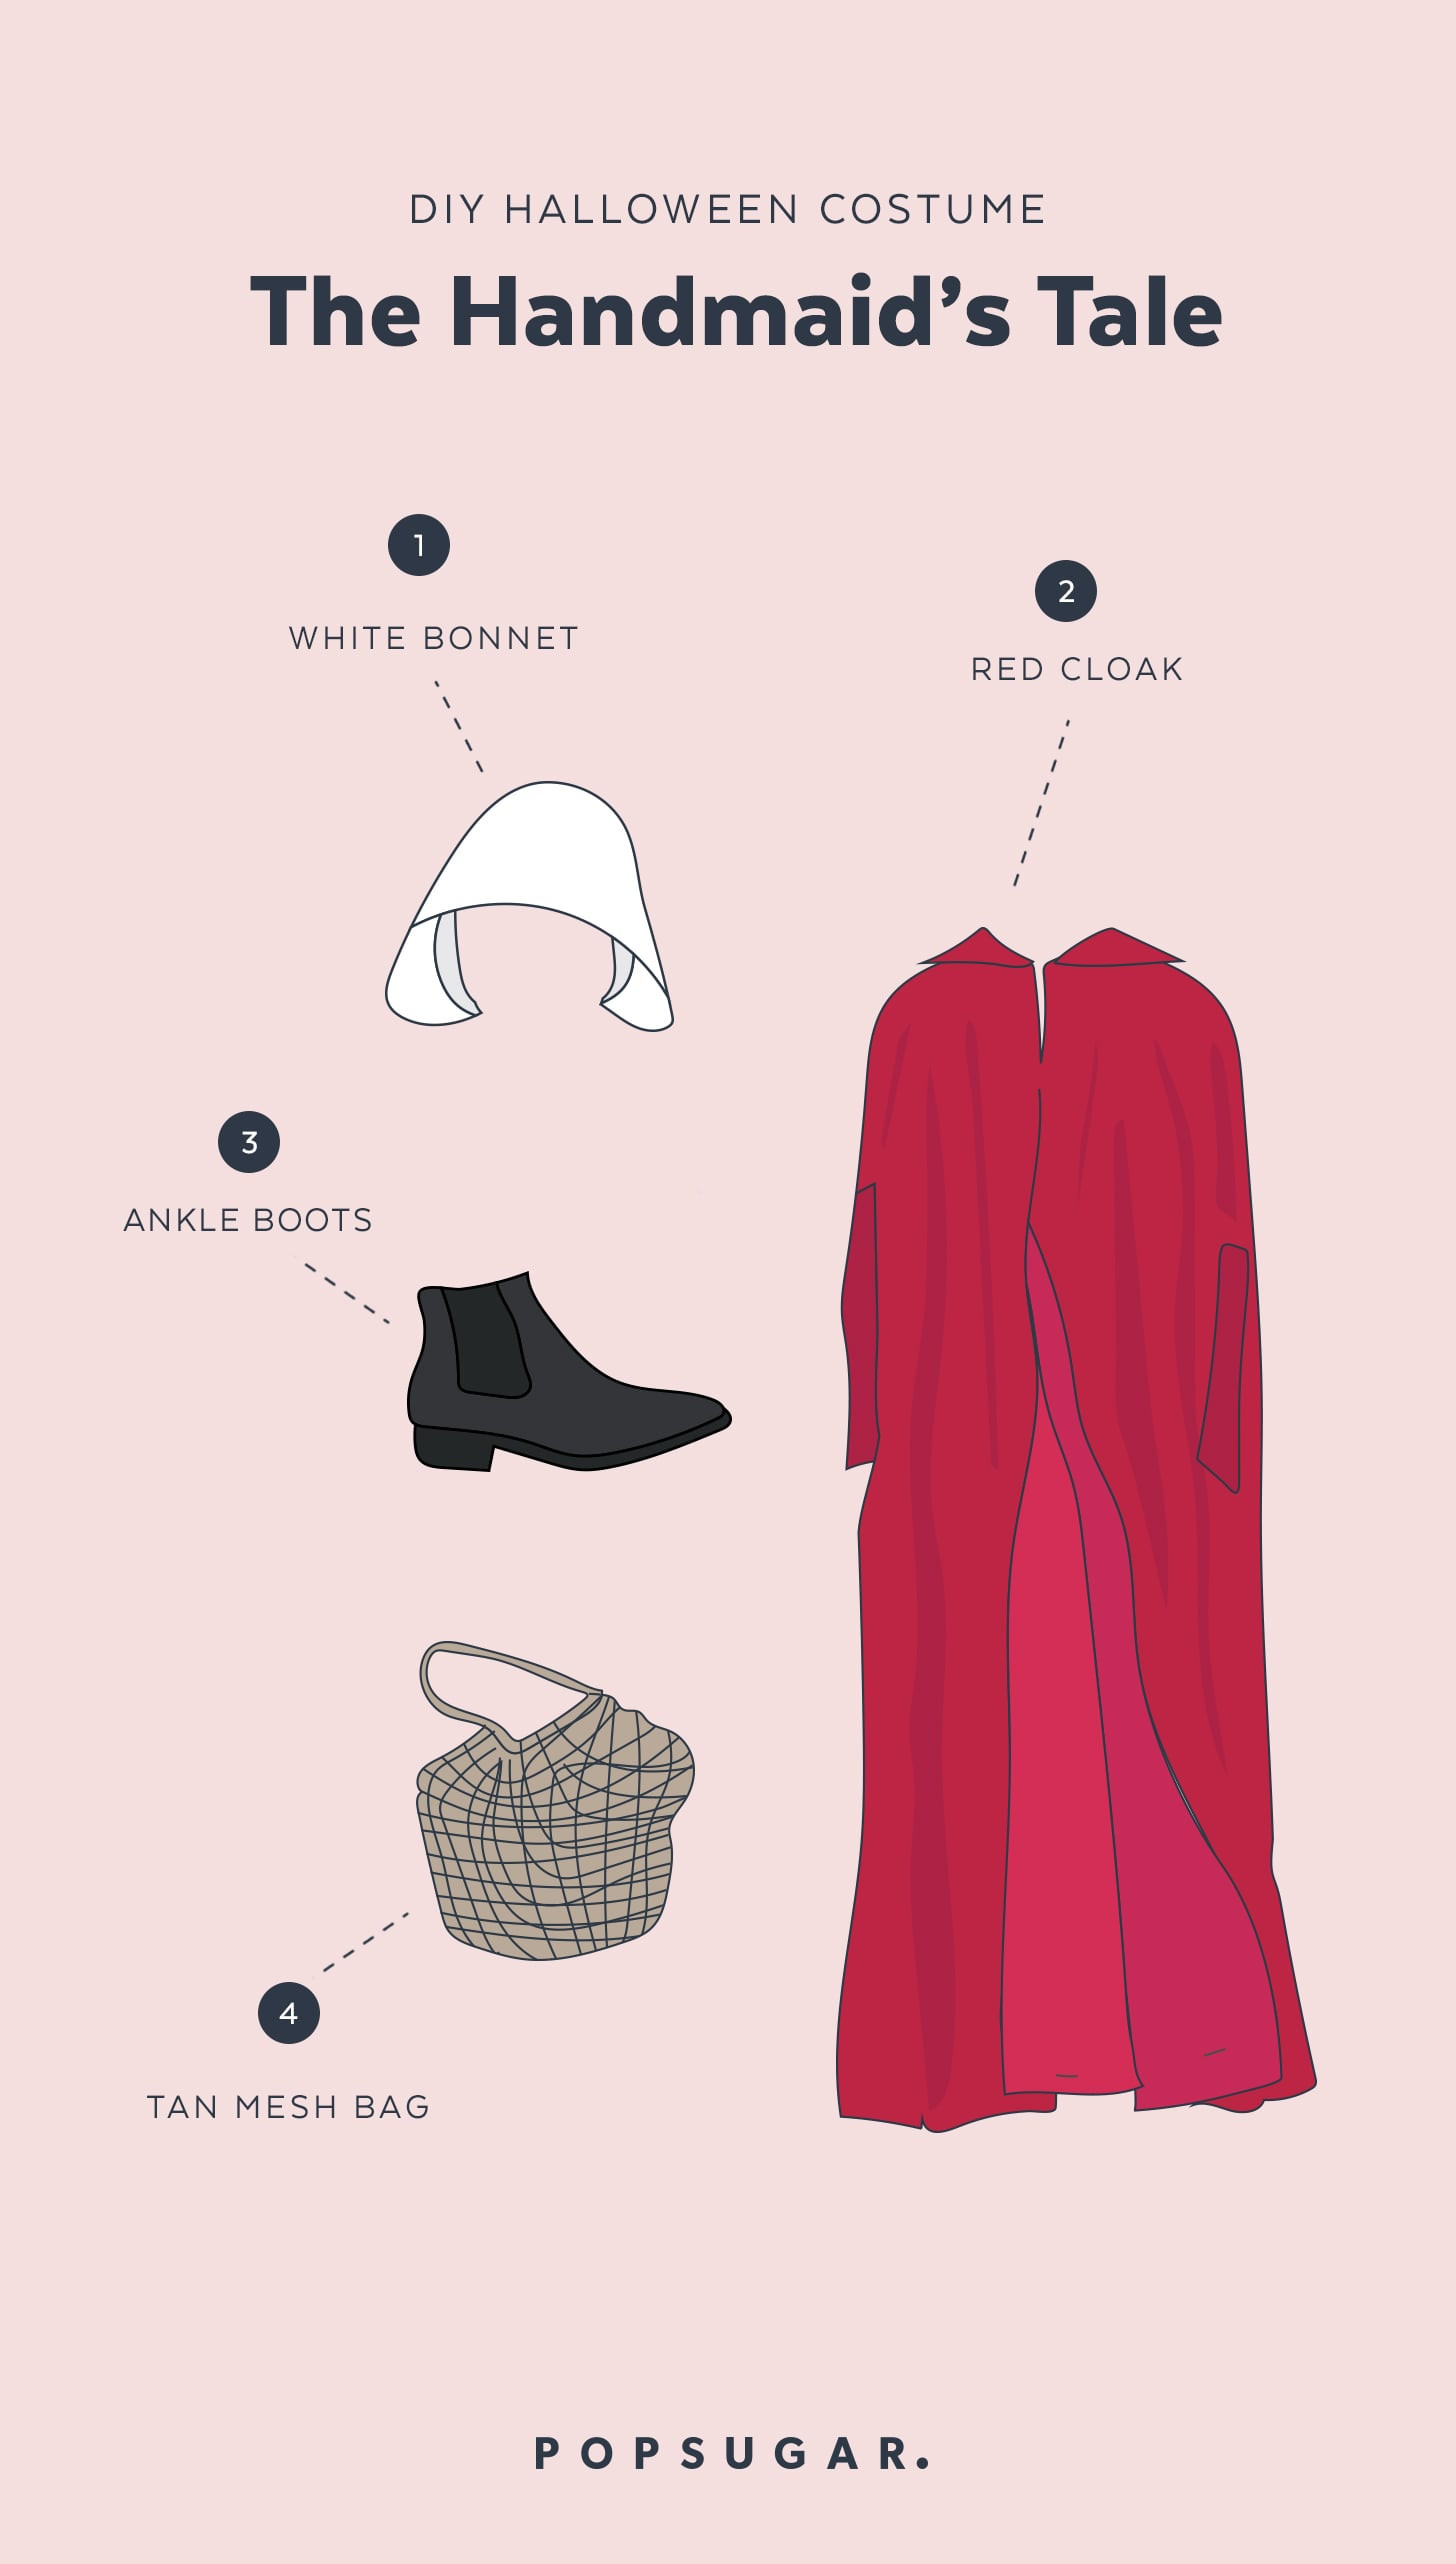 Best ideas about Handmaid'S Tale Costume DIY . Save or Pin Handmaid s Tale Halloween Costume Now.